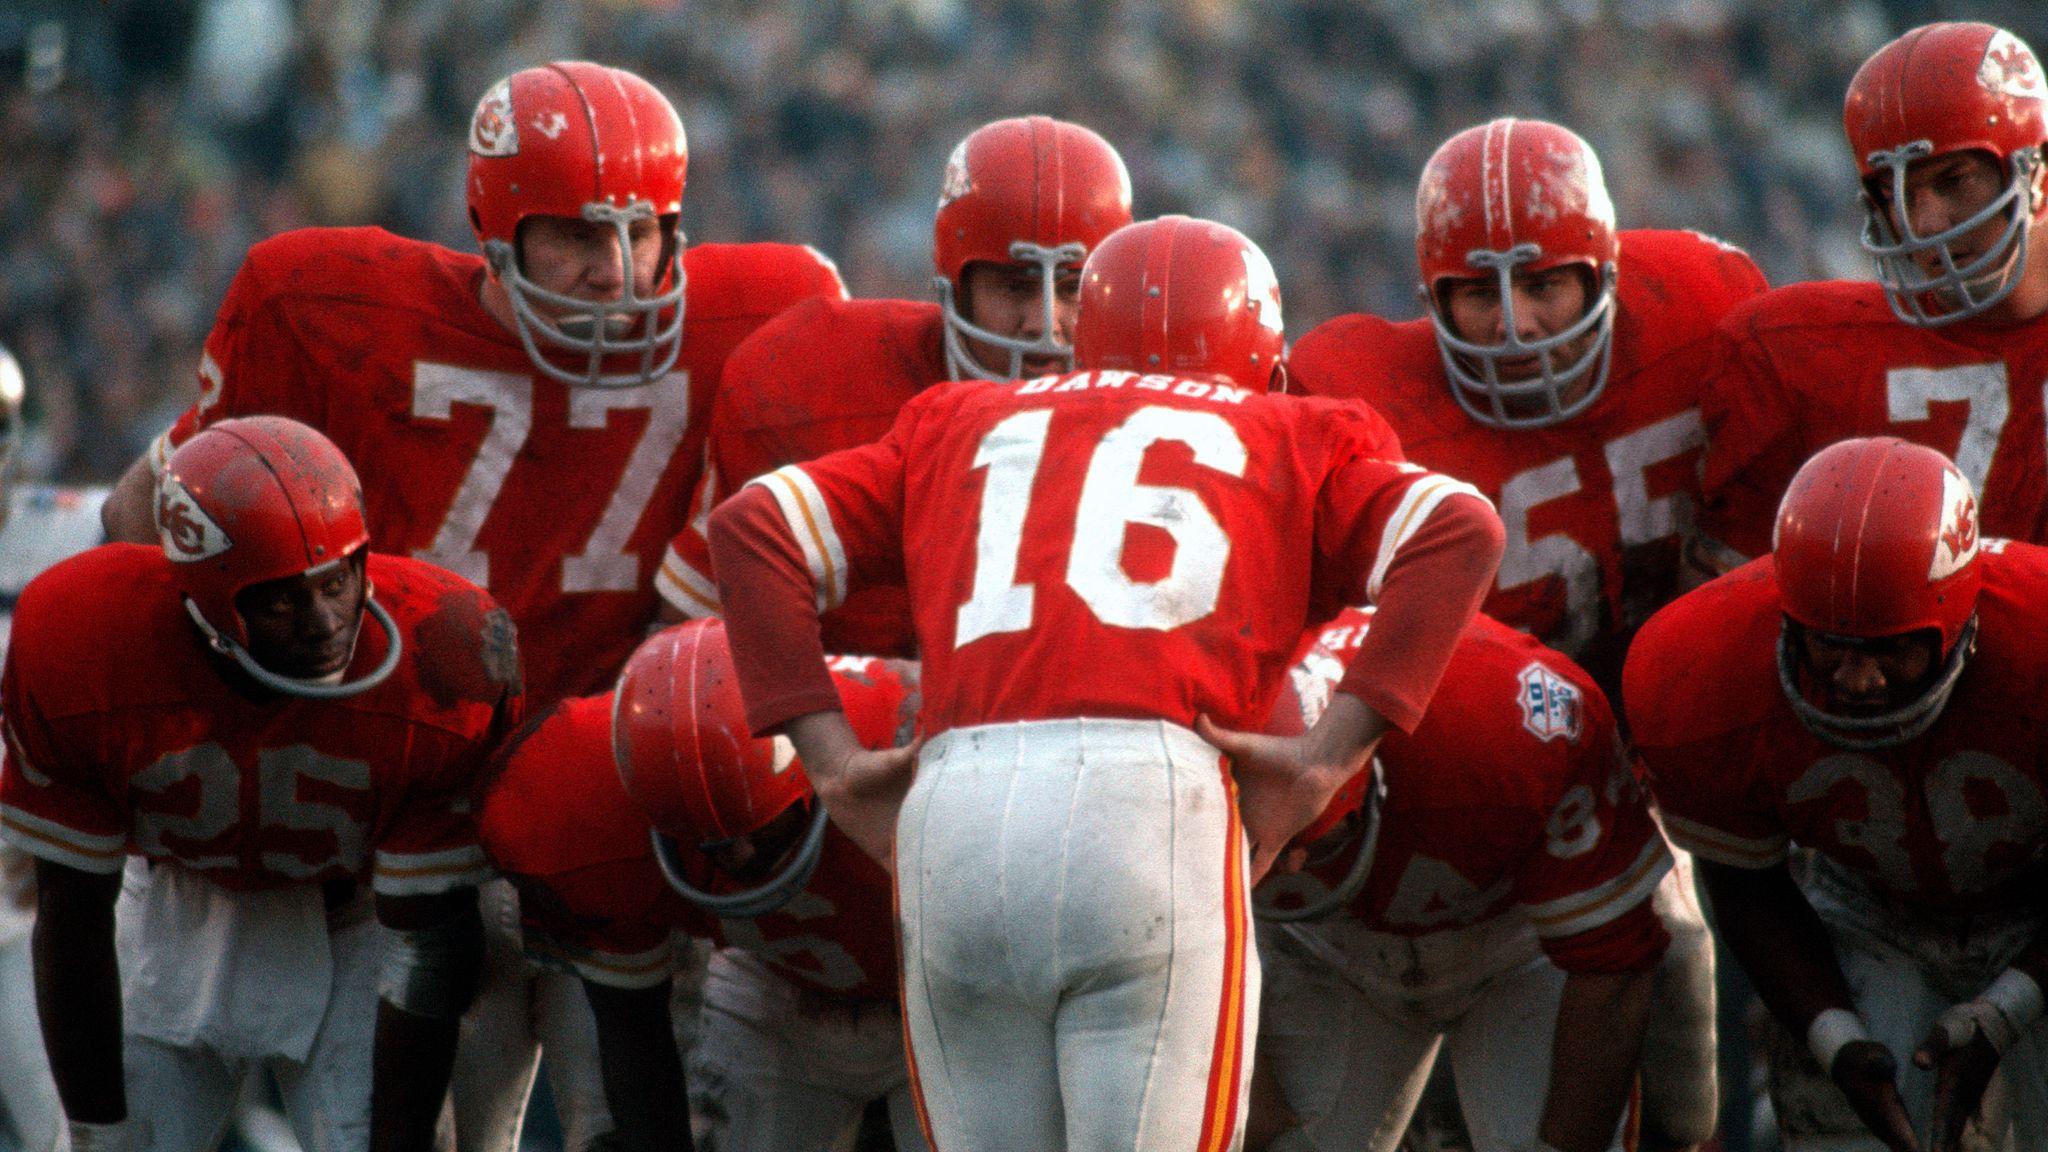 Kansas City Chiefs: Road to Super Bowl LIV in Miami